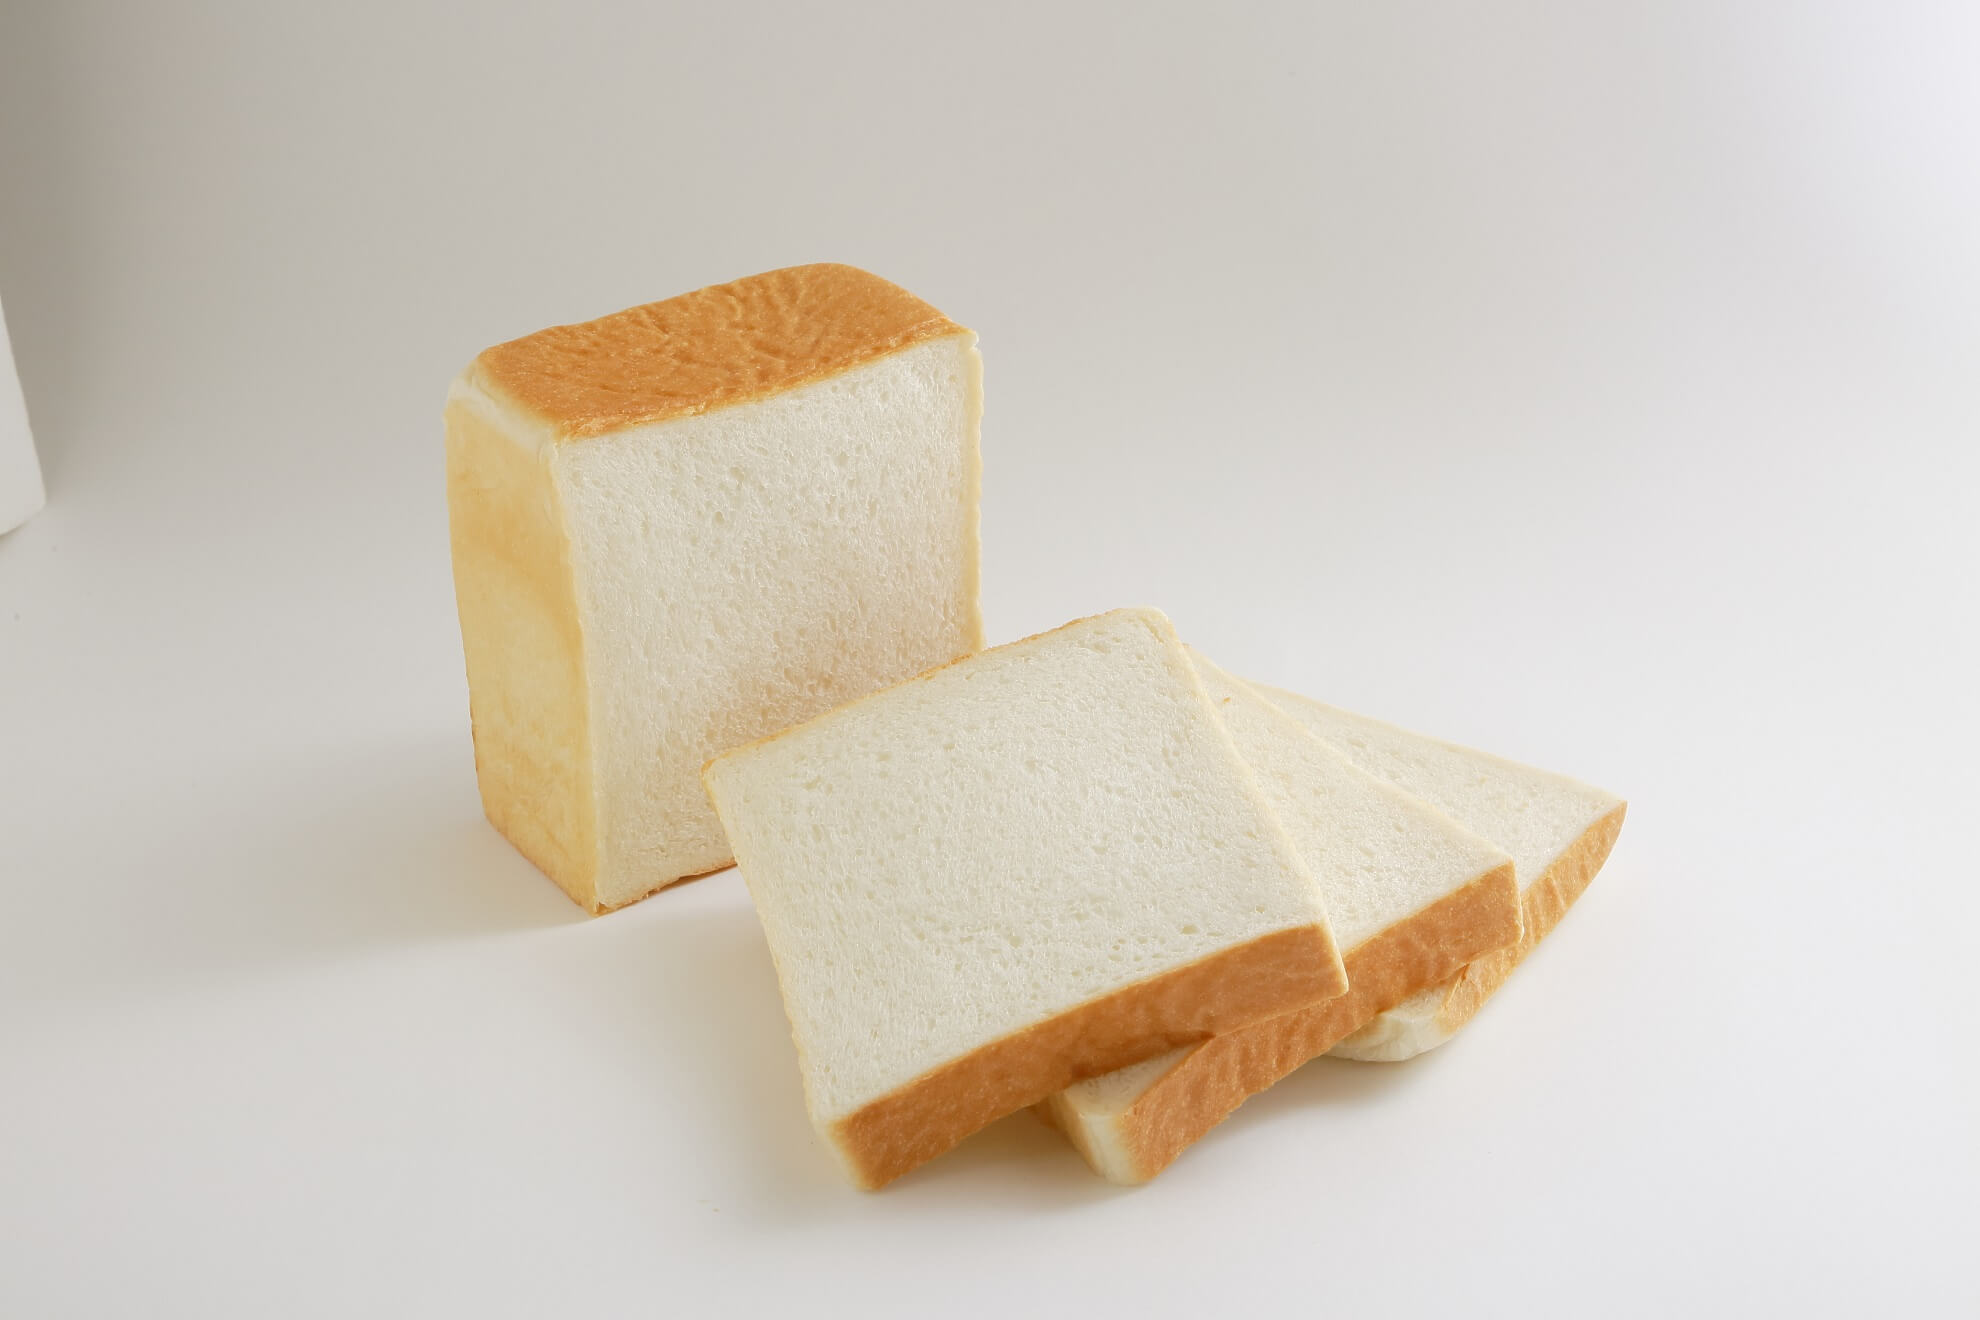 %e3%82%a2%e3%82%a4%e3%82%b9%e9%a3%9f%e3%83%8f%e3%82%9a%e3%83%b3-ice-bread-2